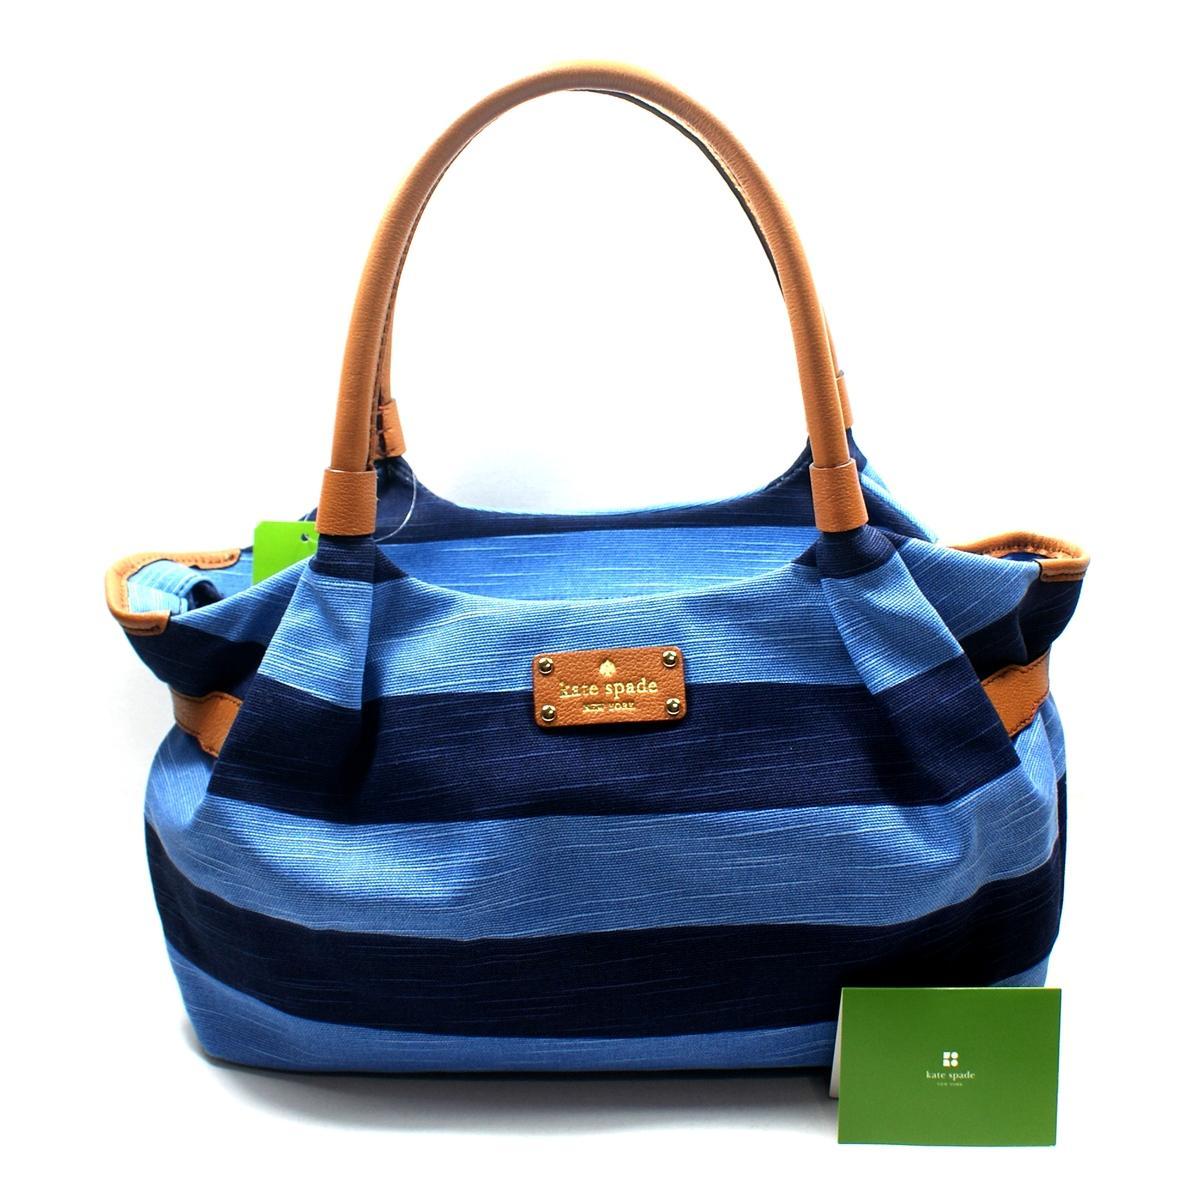 Kate spade blue striped purse